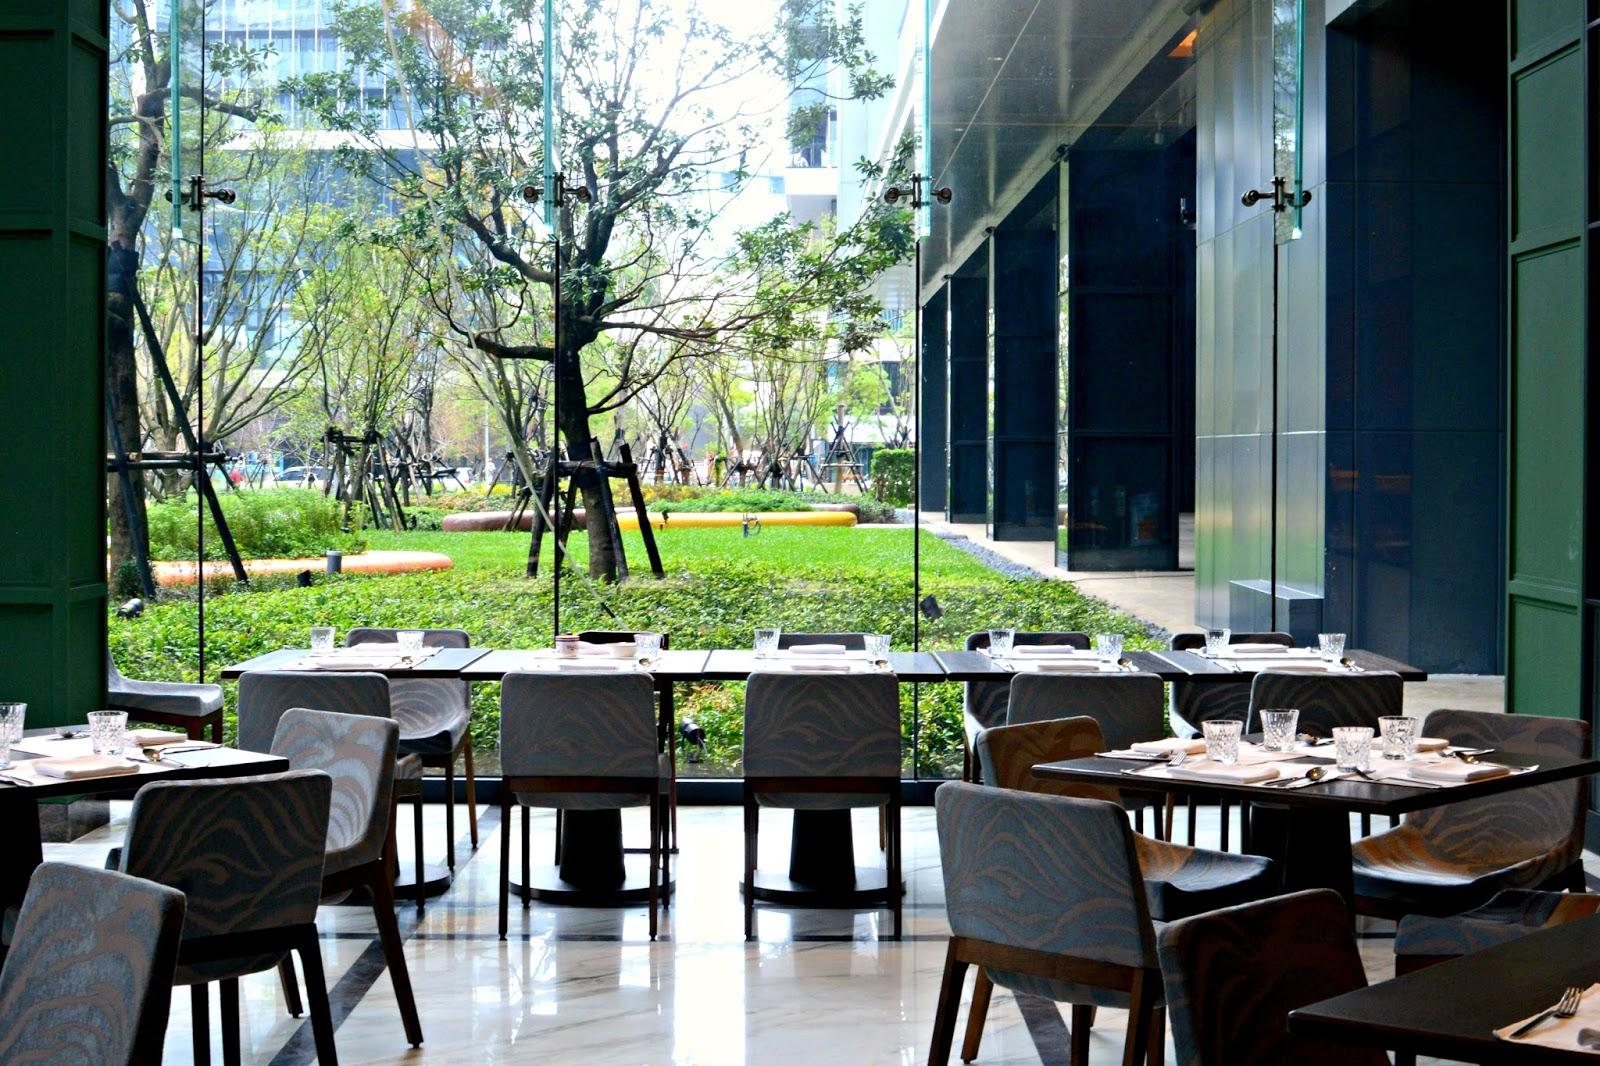 » 臺北:臺北萬豪酒店Taipei Marriott Hotel – Garden Kitchen » Chocolatemuimui's Blog